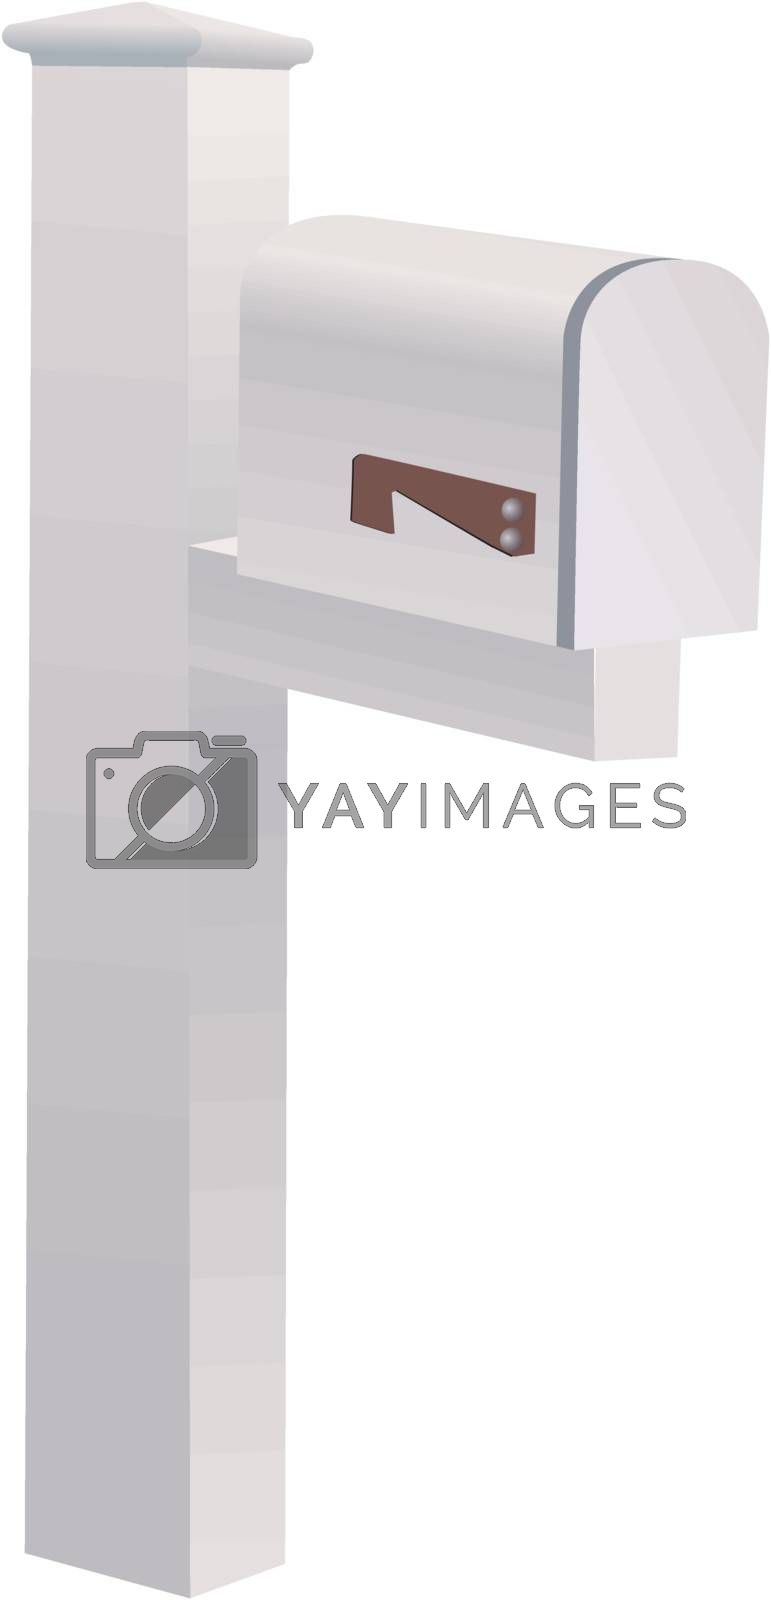 mailbox on white